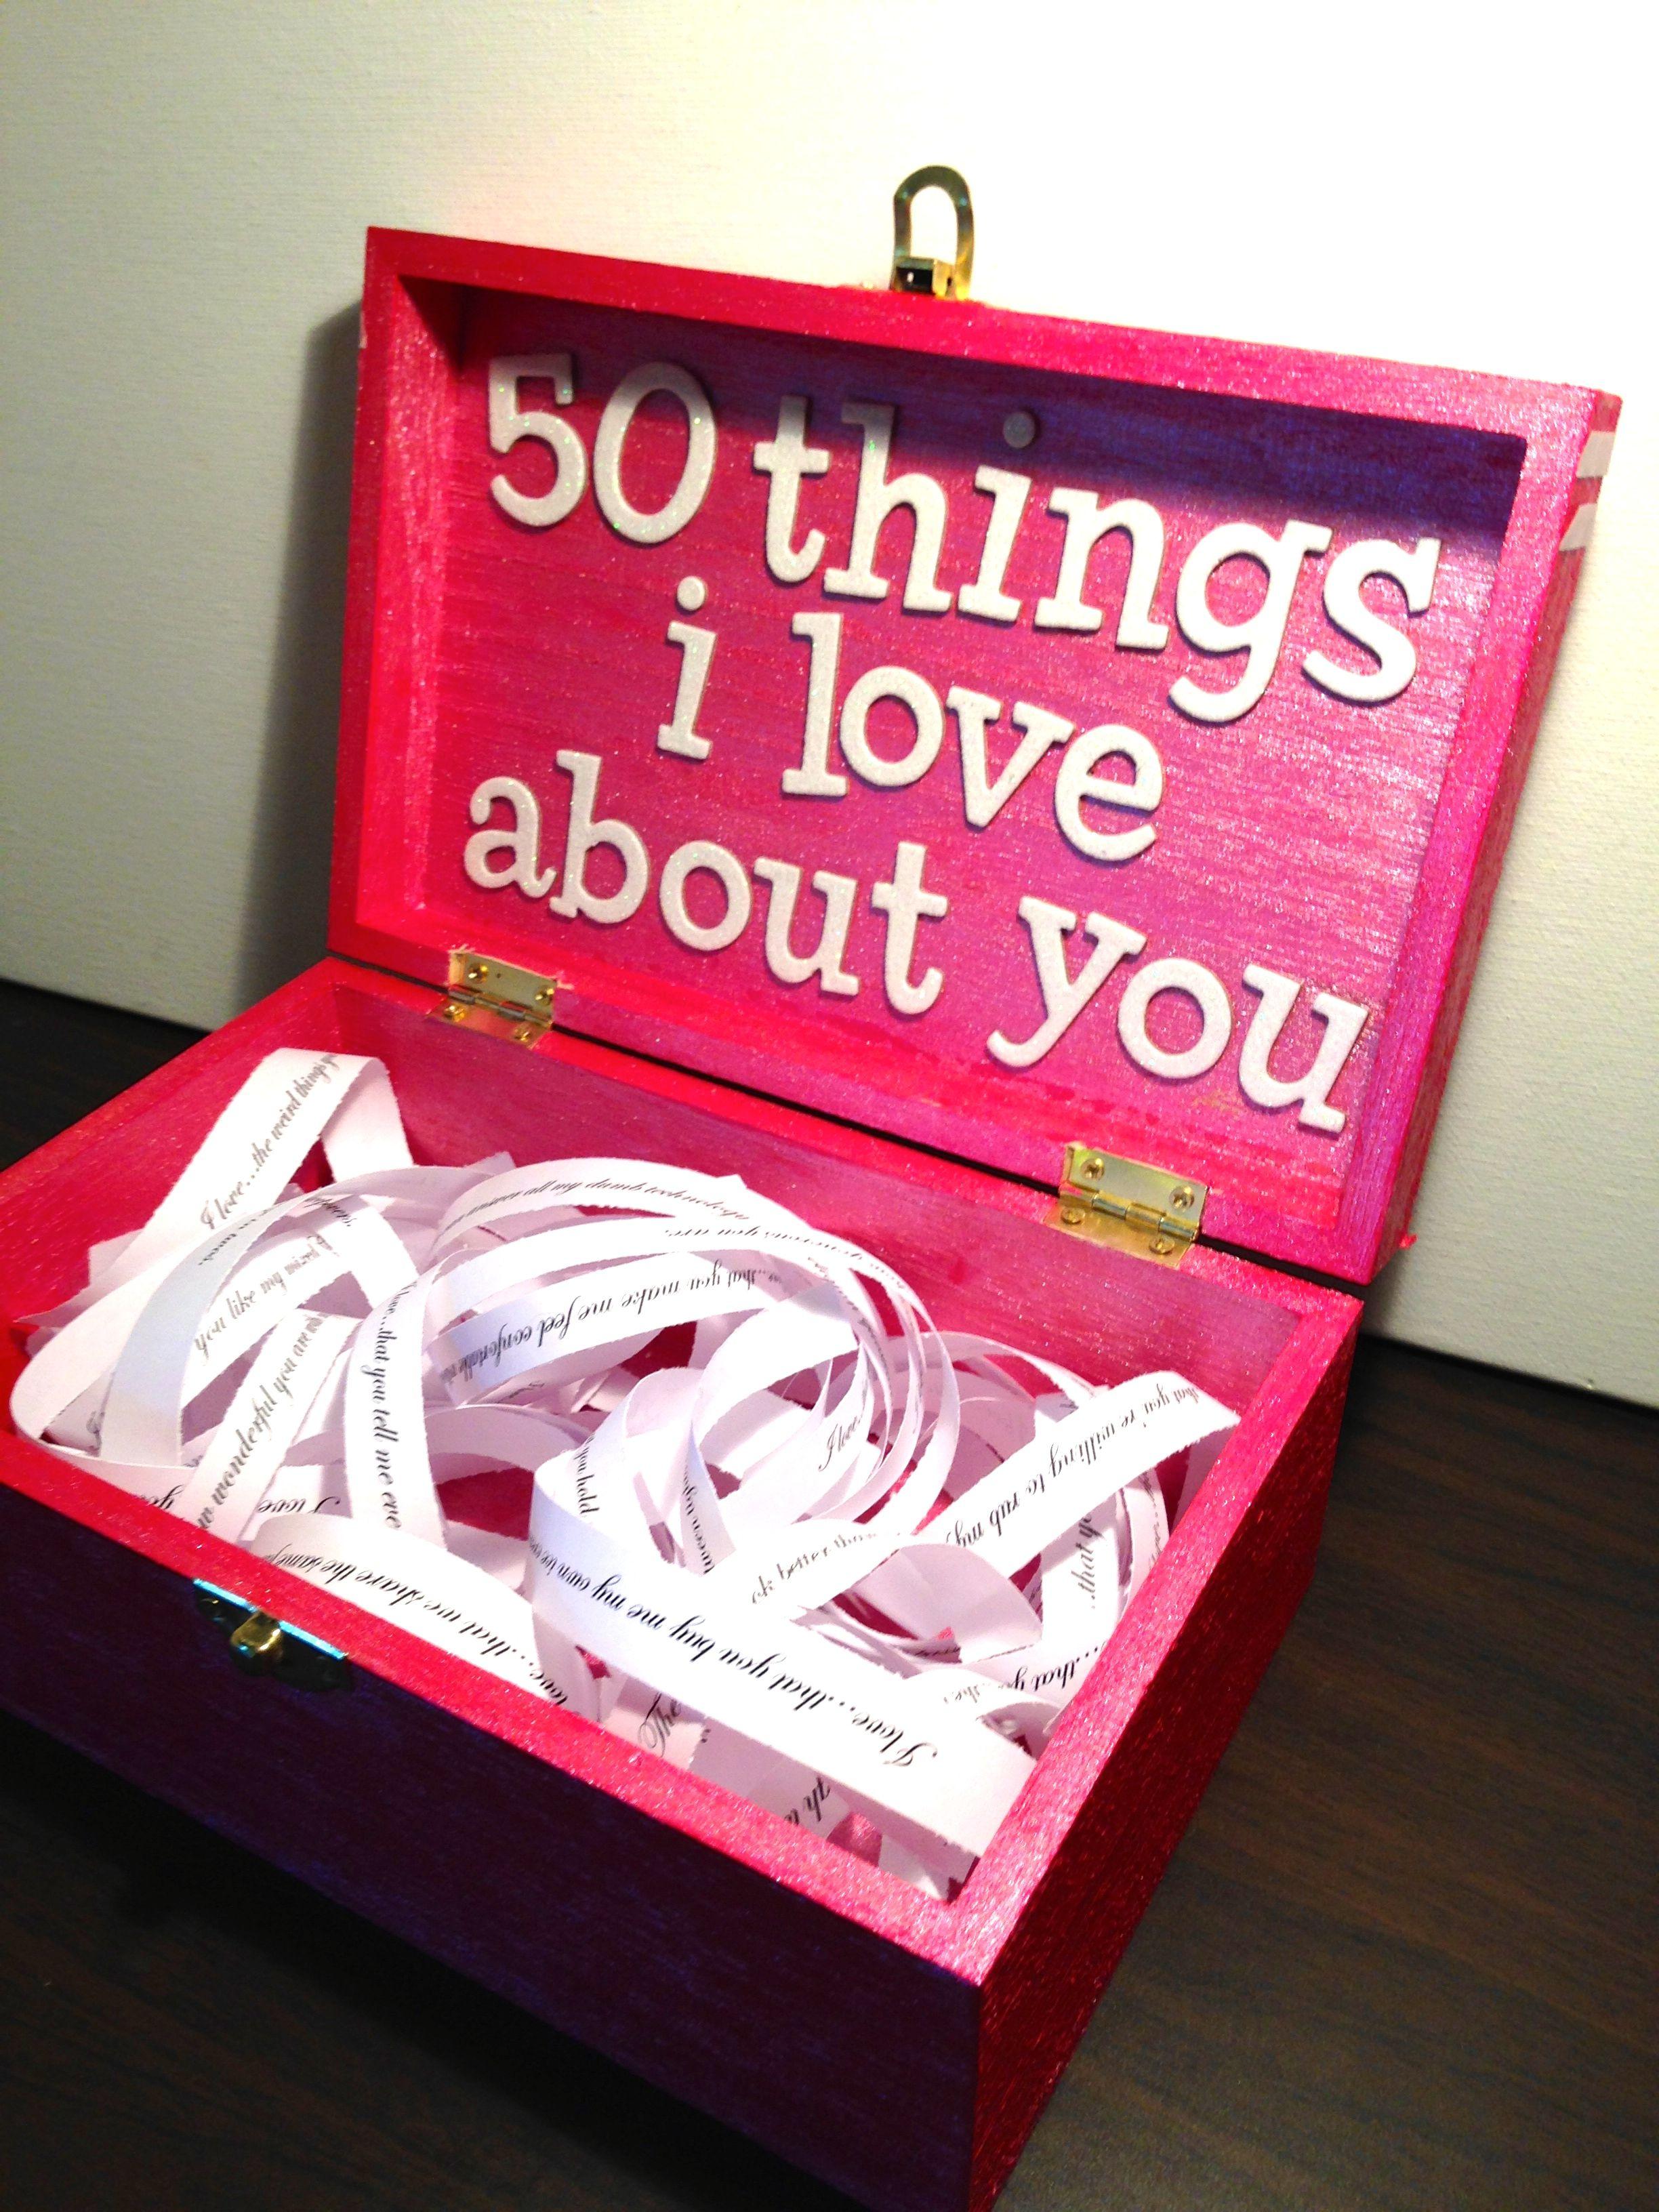 Pin By Raggzz Custom Apparel And Gift On Bev Funny Birthday Gifts Birthday Gifts For Boyfriend Diy Birthday Gifts For Boyfriend